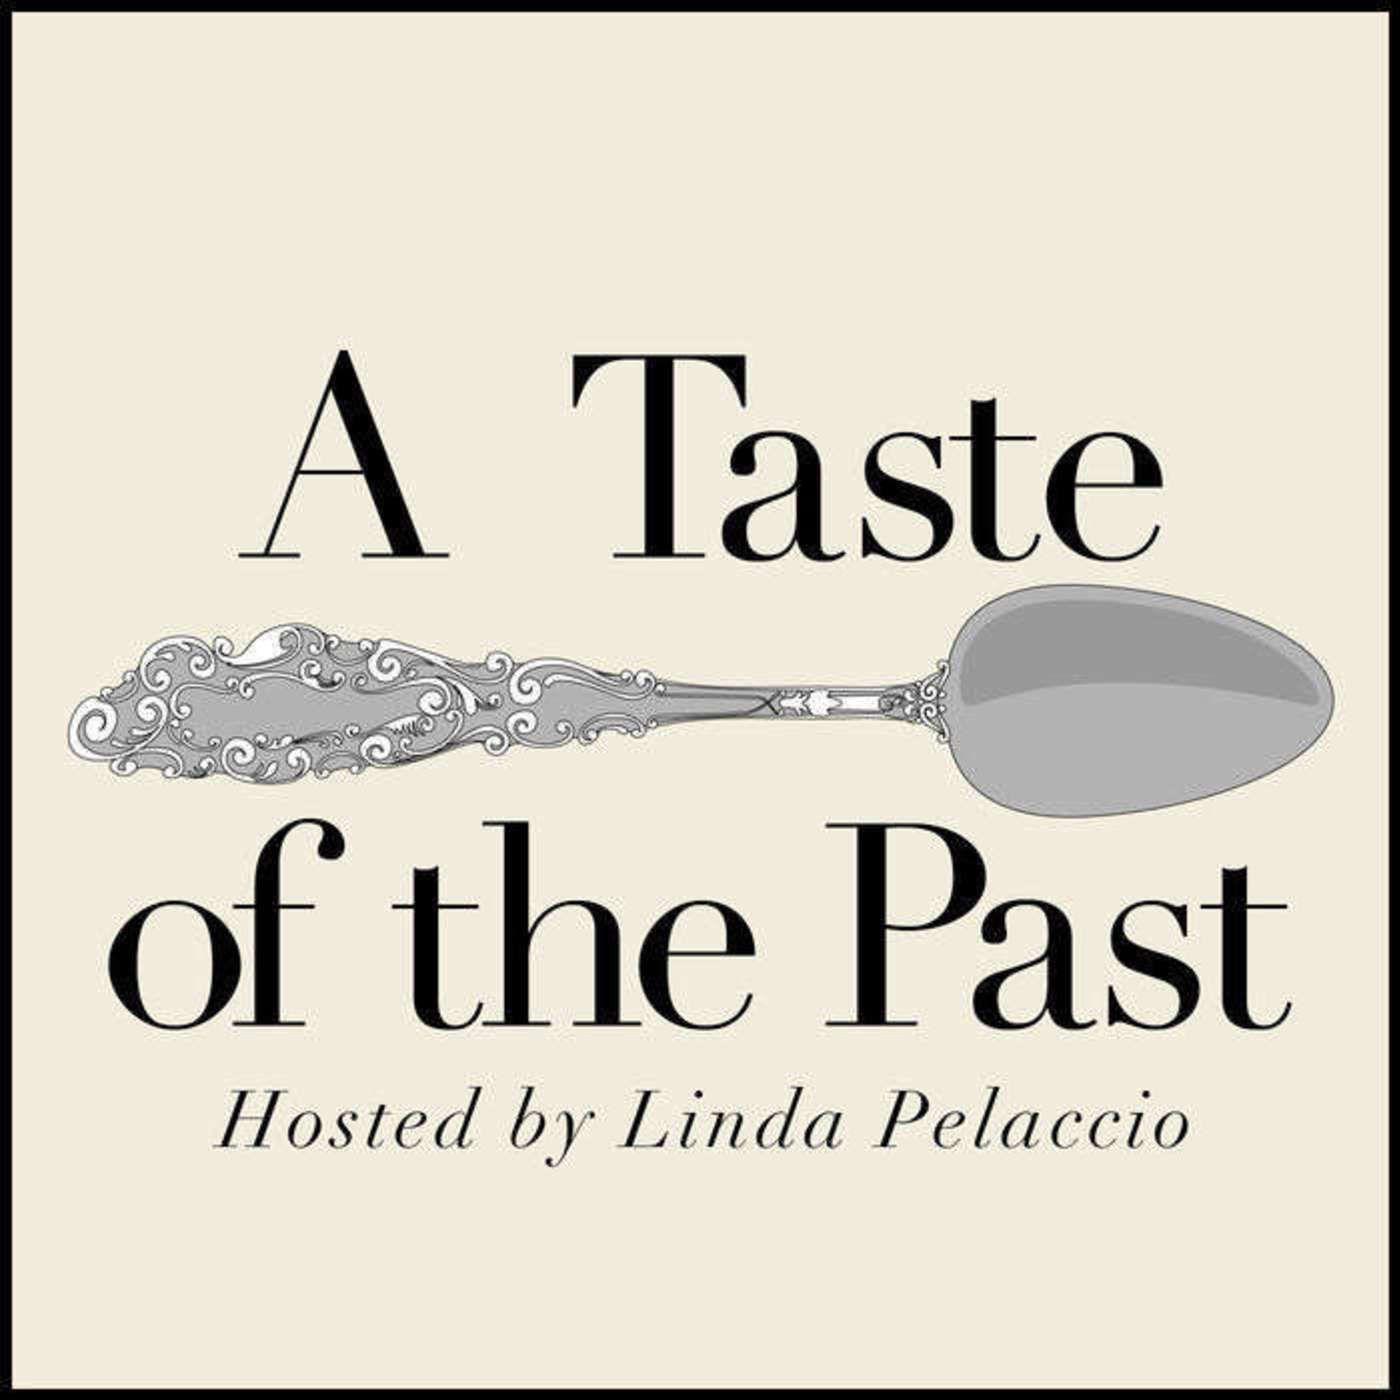 Episode 133: History of Vegetarianism